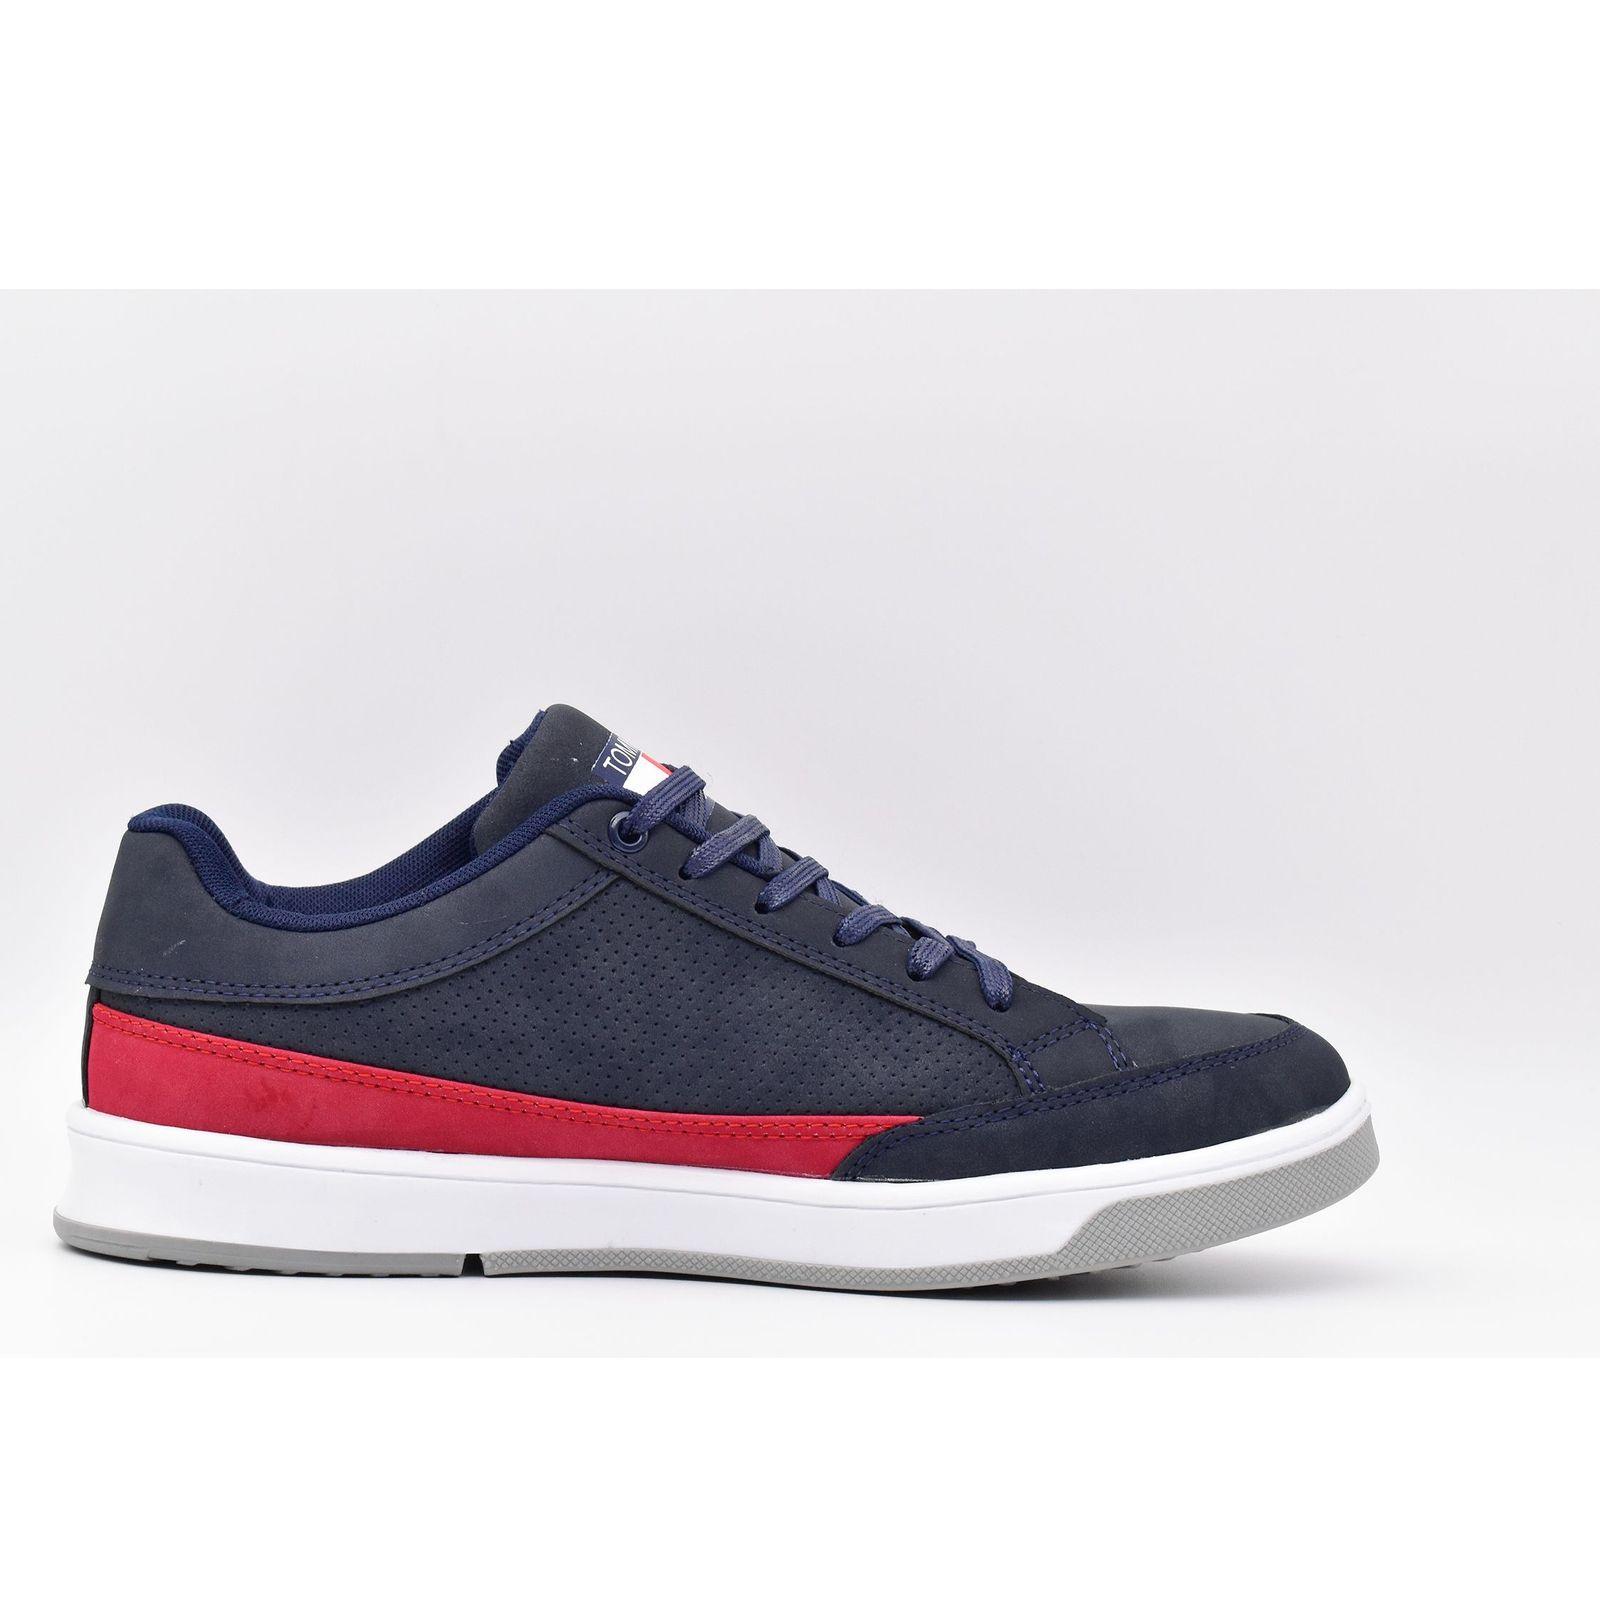 کفش روزمره مردانه مدل رهاورد کد 5513 -  - 7